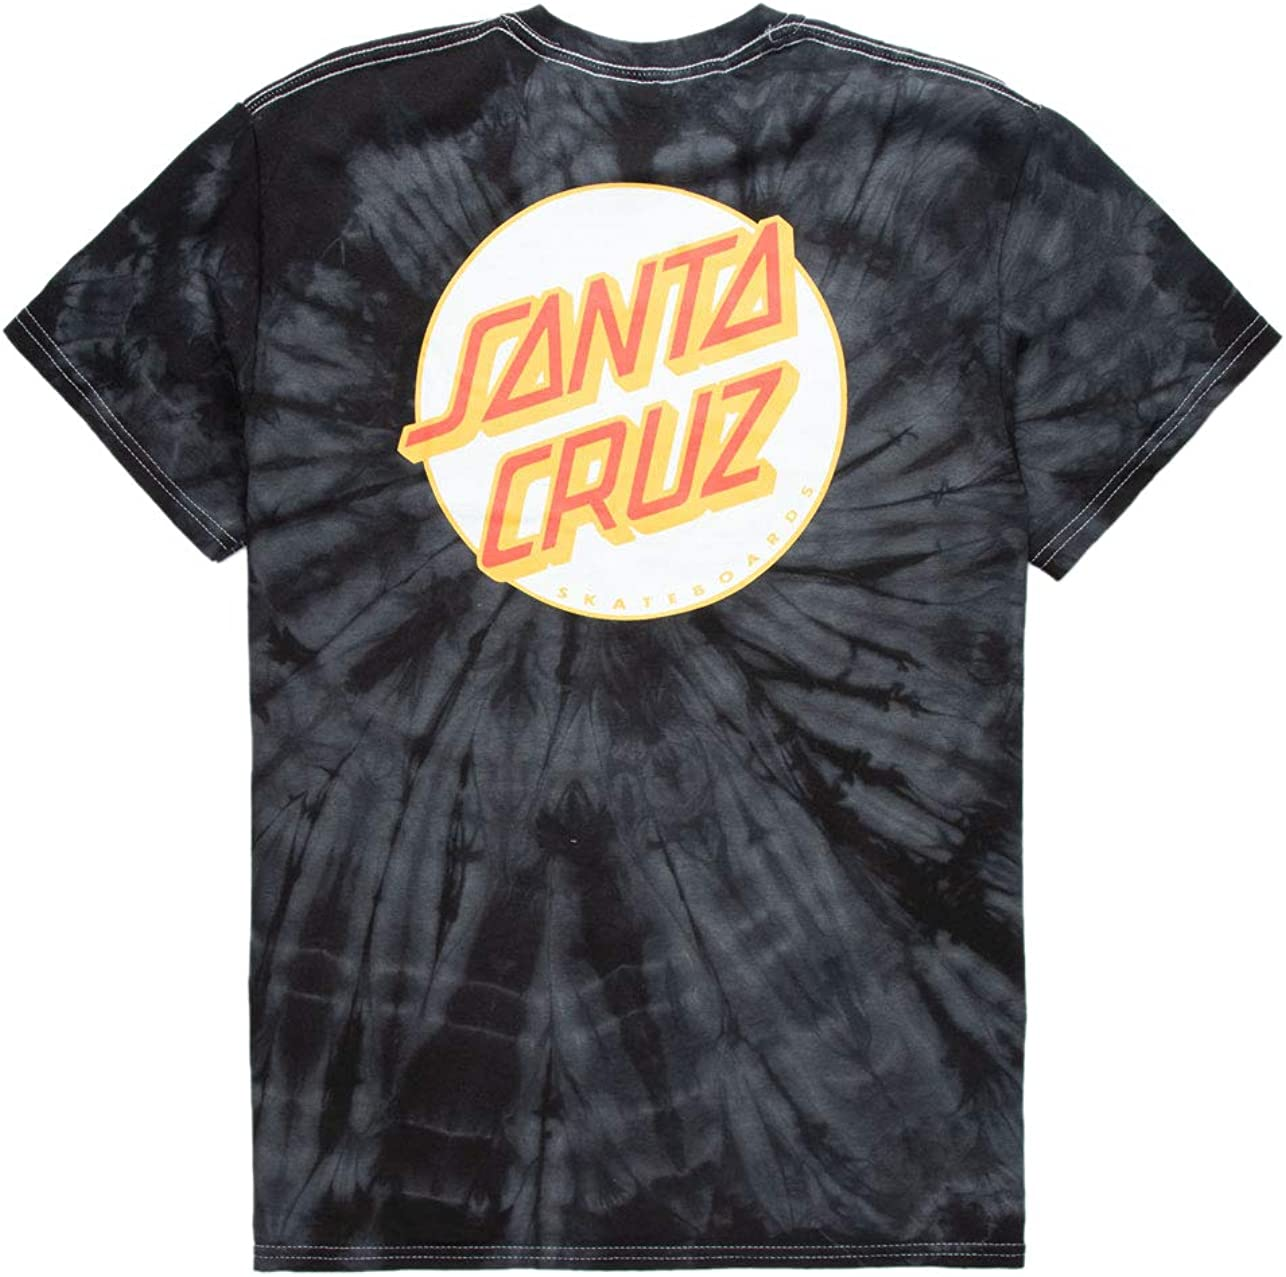 Santa Cruz Men's Other S/S Shirts